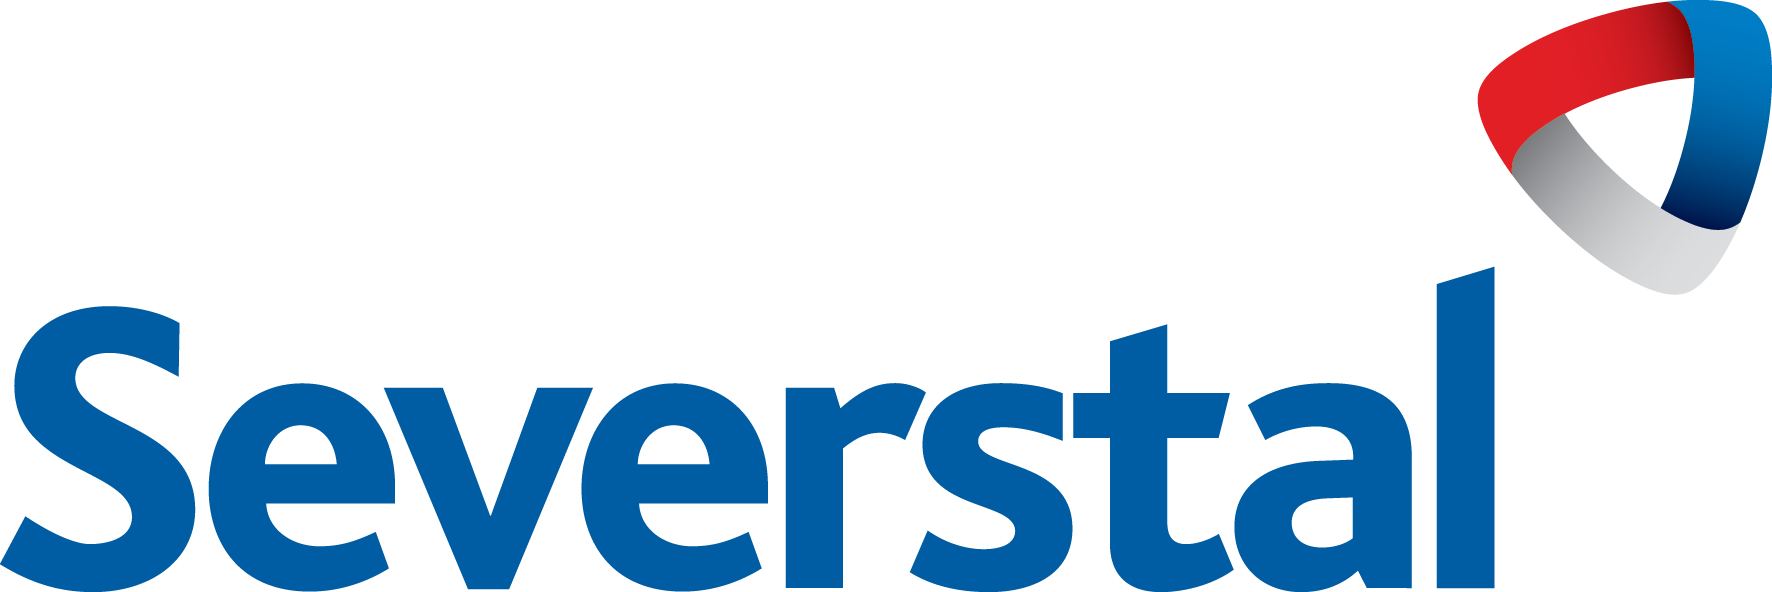 PAO Severstal Logo